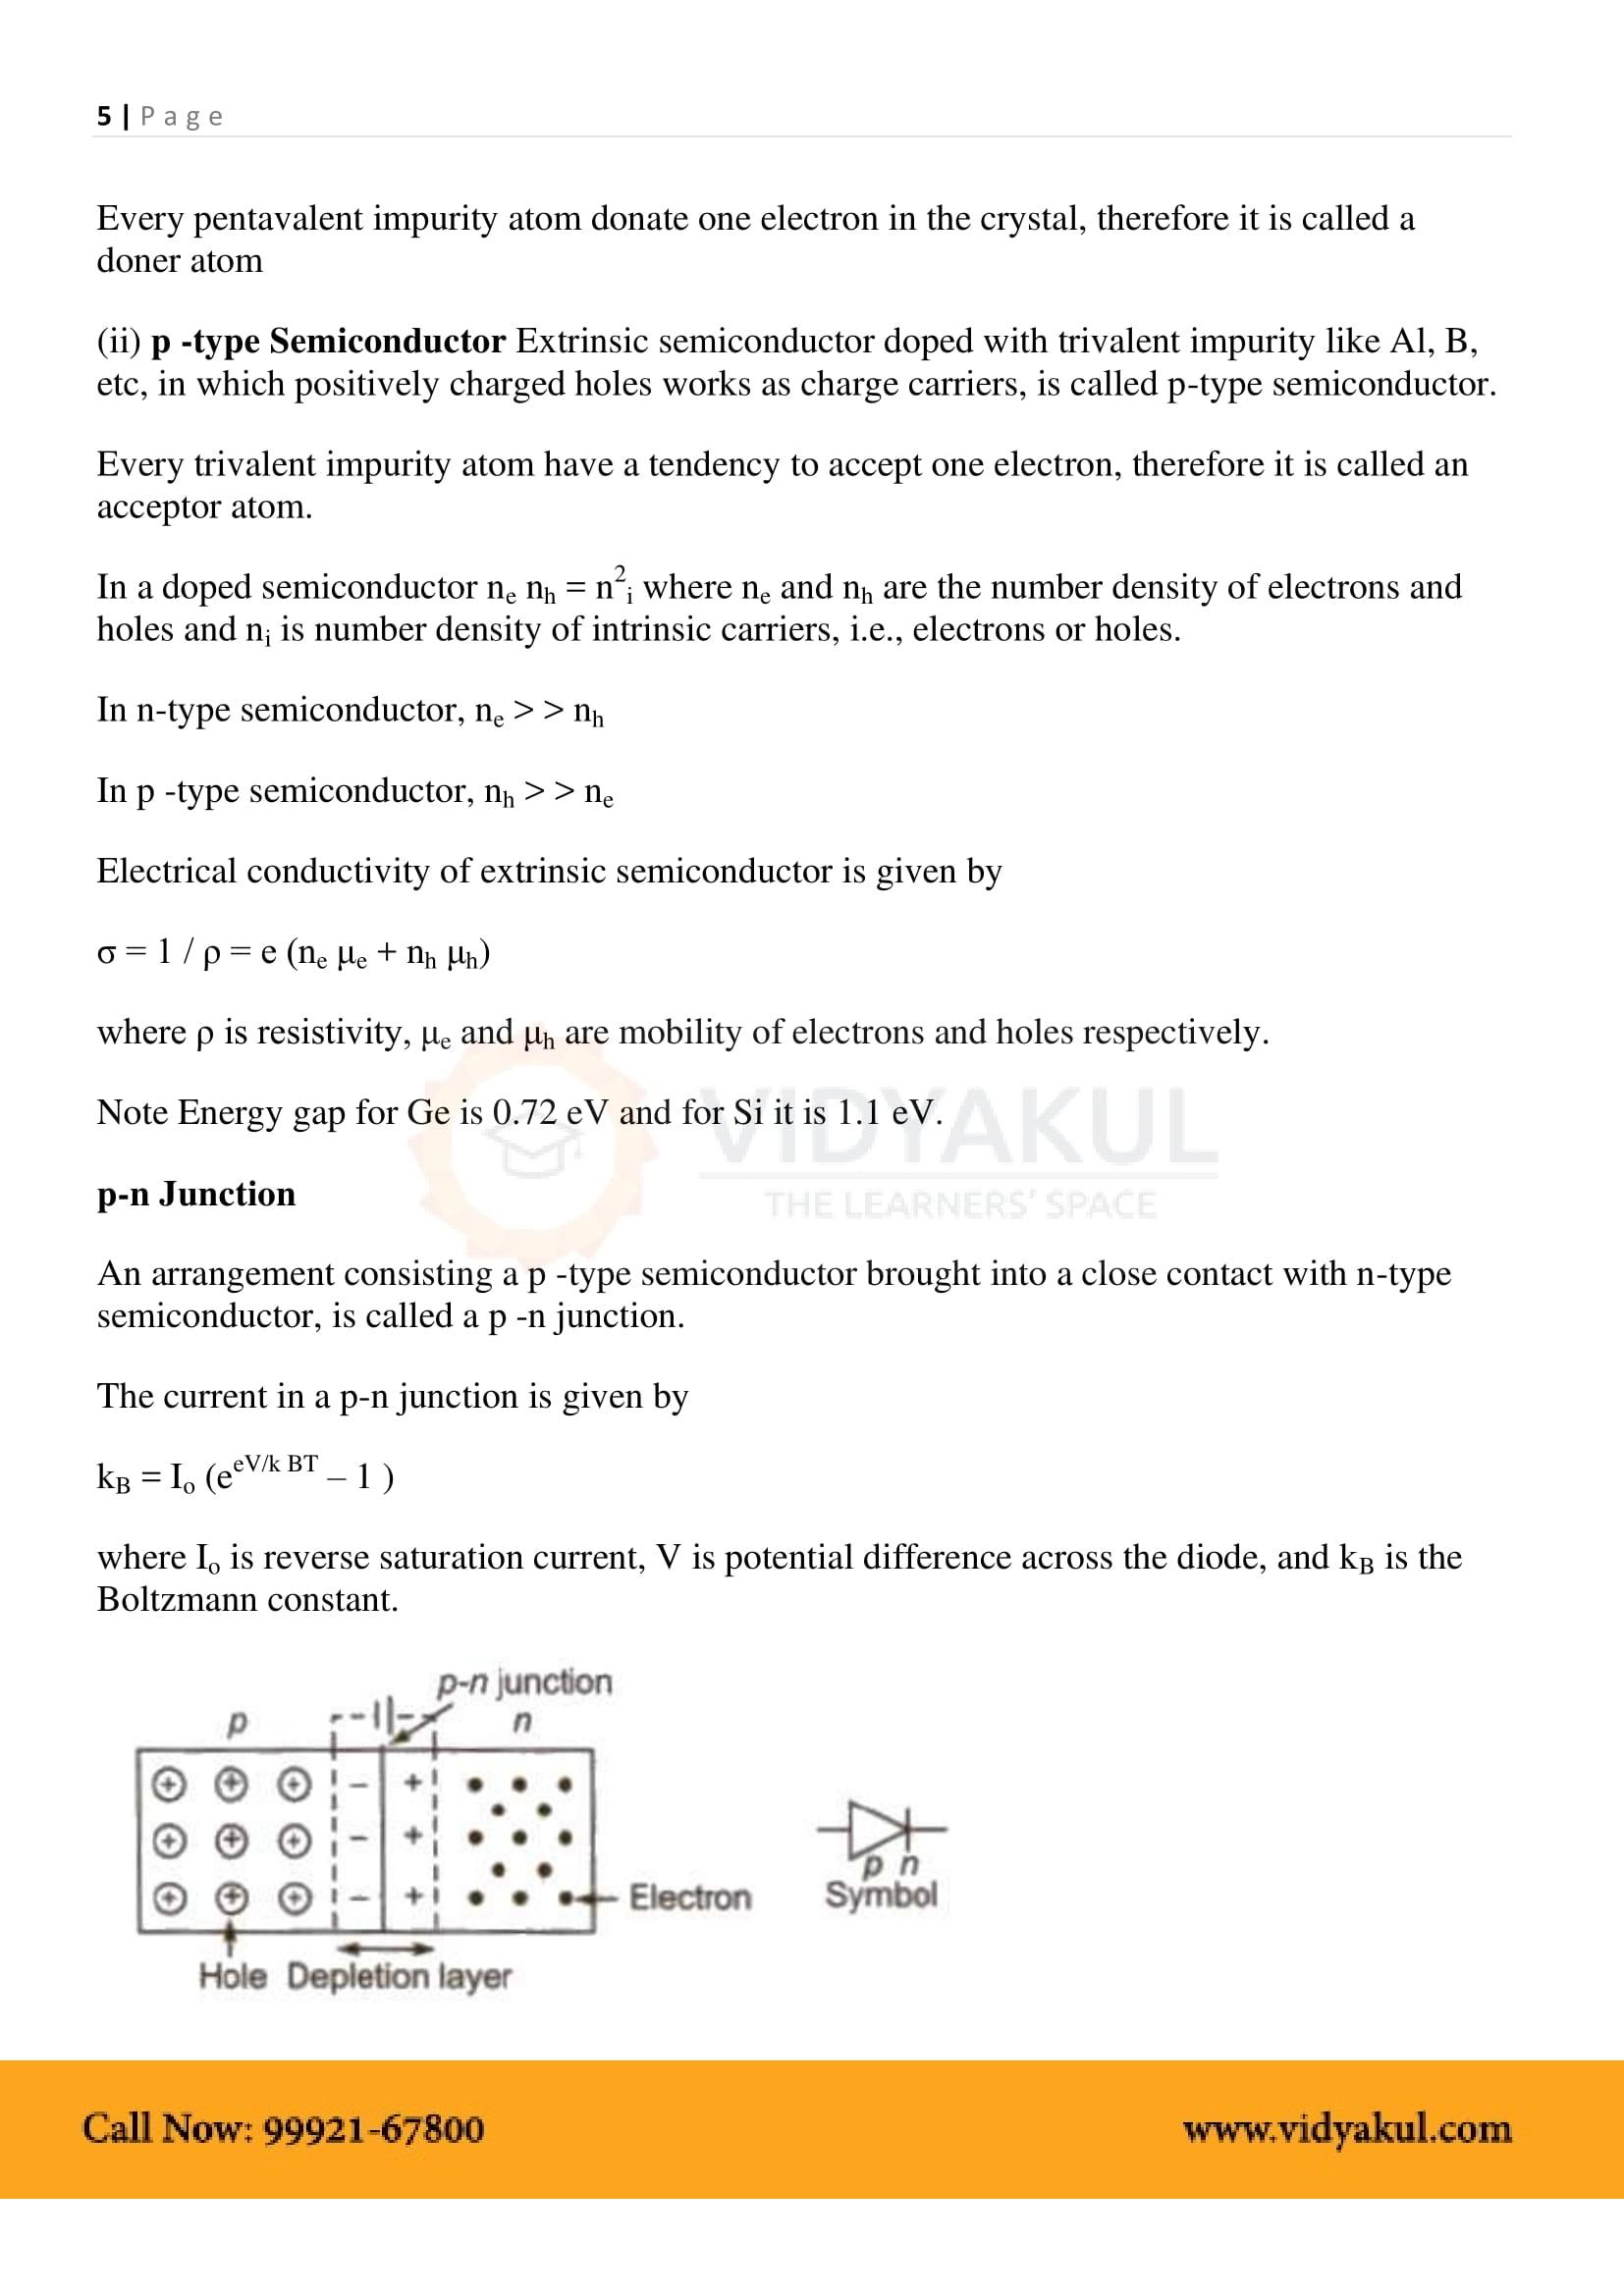 Semiconductor Electronics: Materials Class 12 Notes   Vidyakul